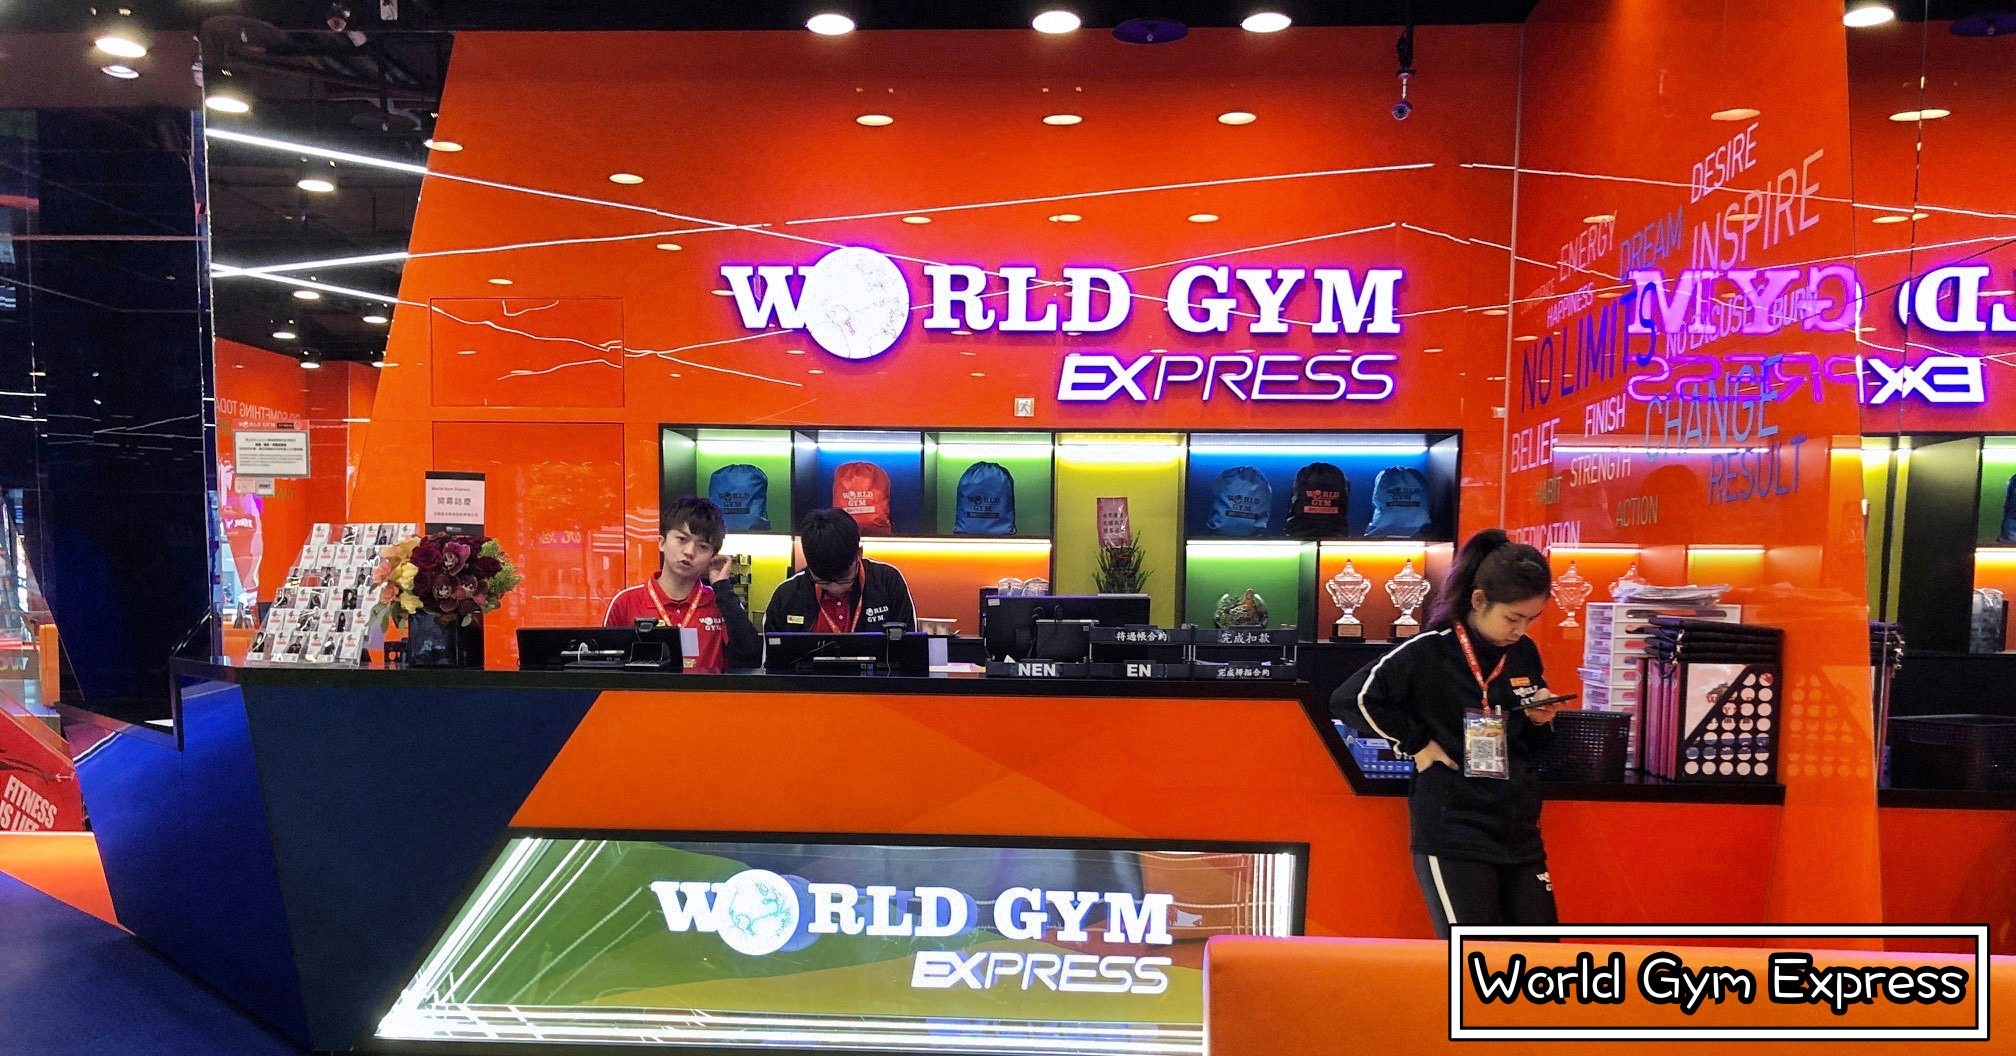 World Gym,健身房推薦,World Gym Express,World Gym Express費用,World Gym Express價錢,World Gym Express收費,World Gym Express評價,World Gym Express民權西路 @Nash,神之領域